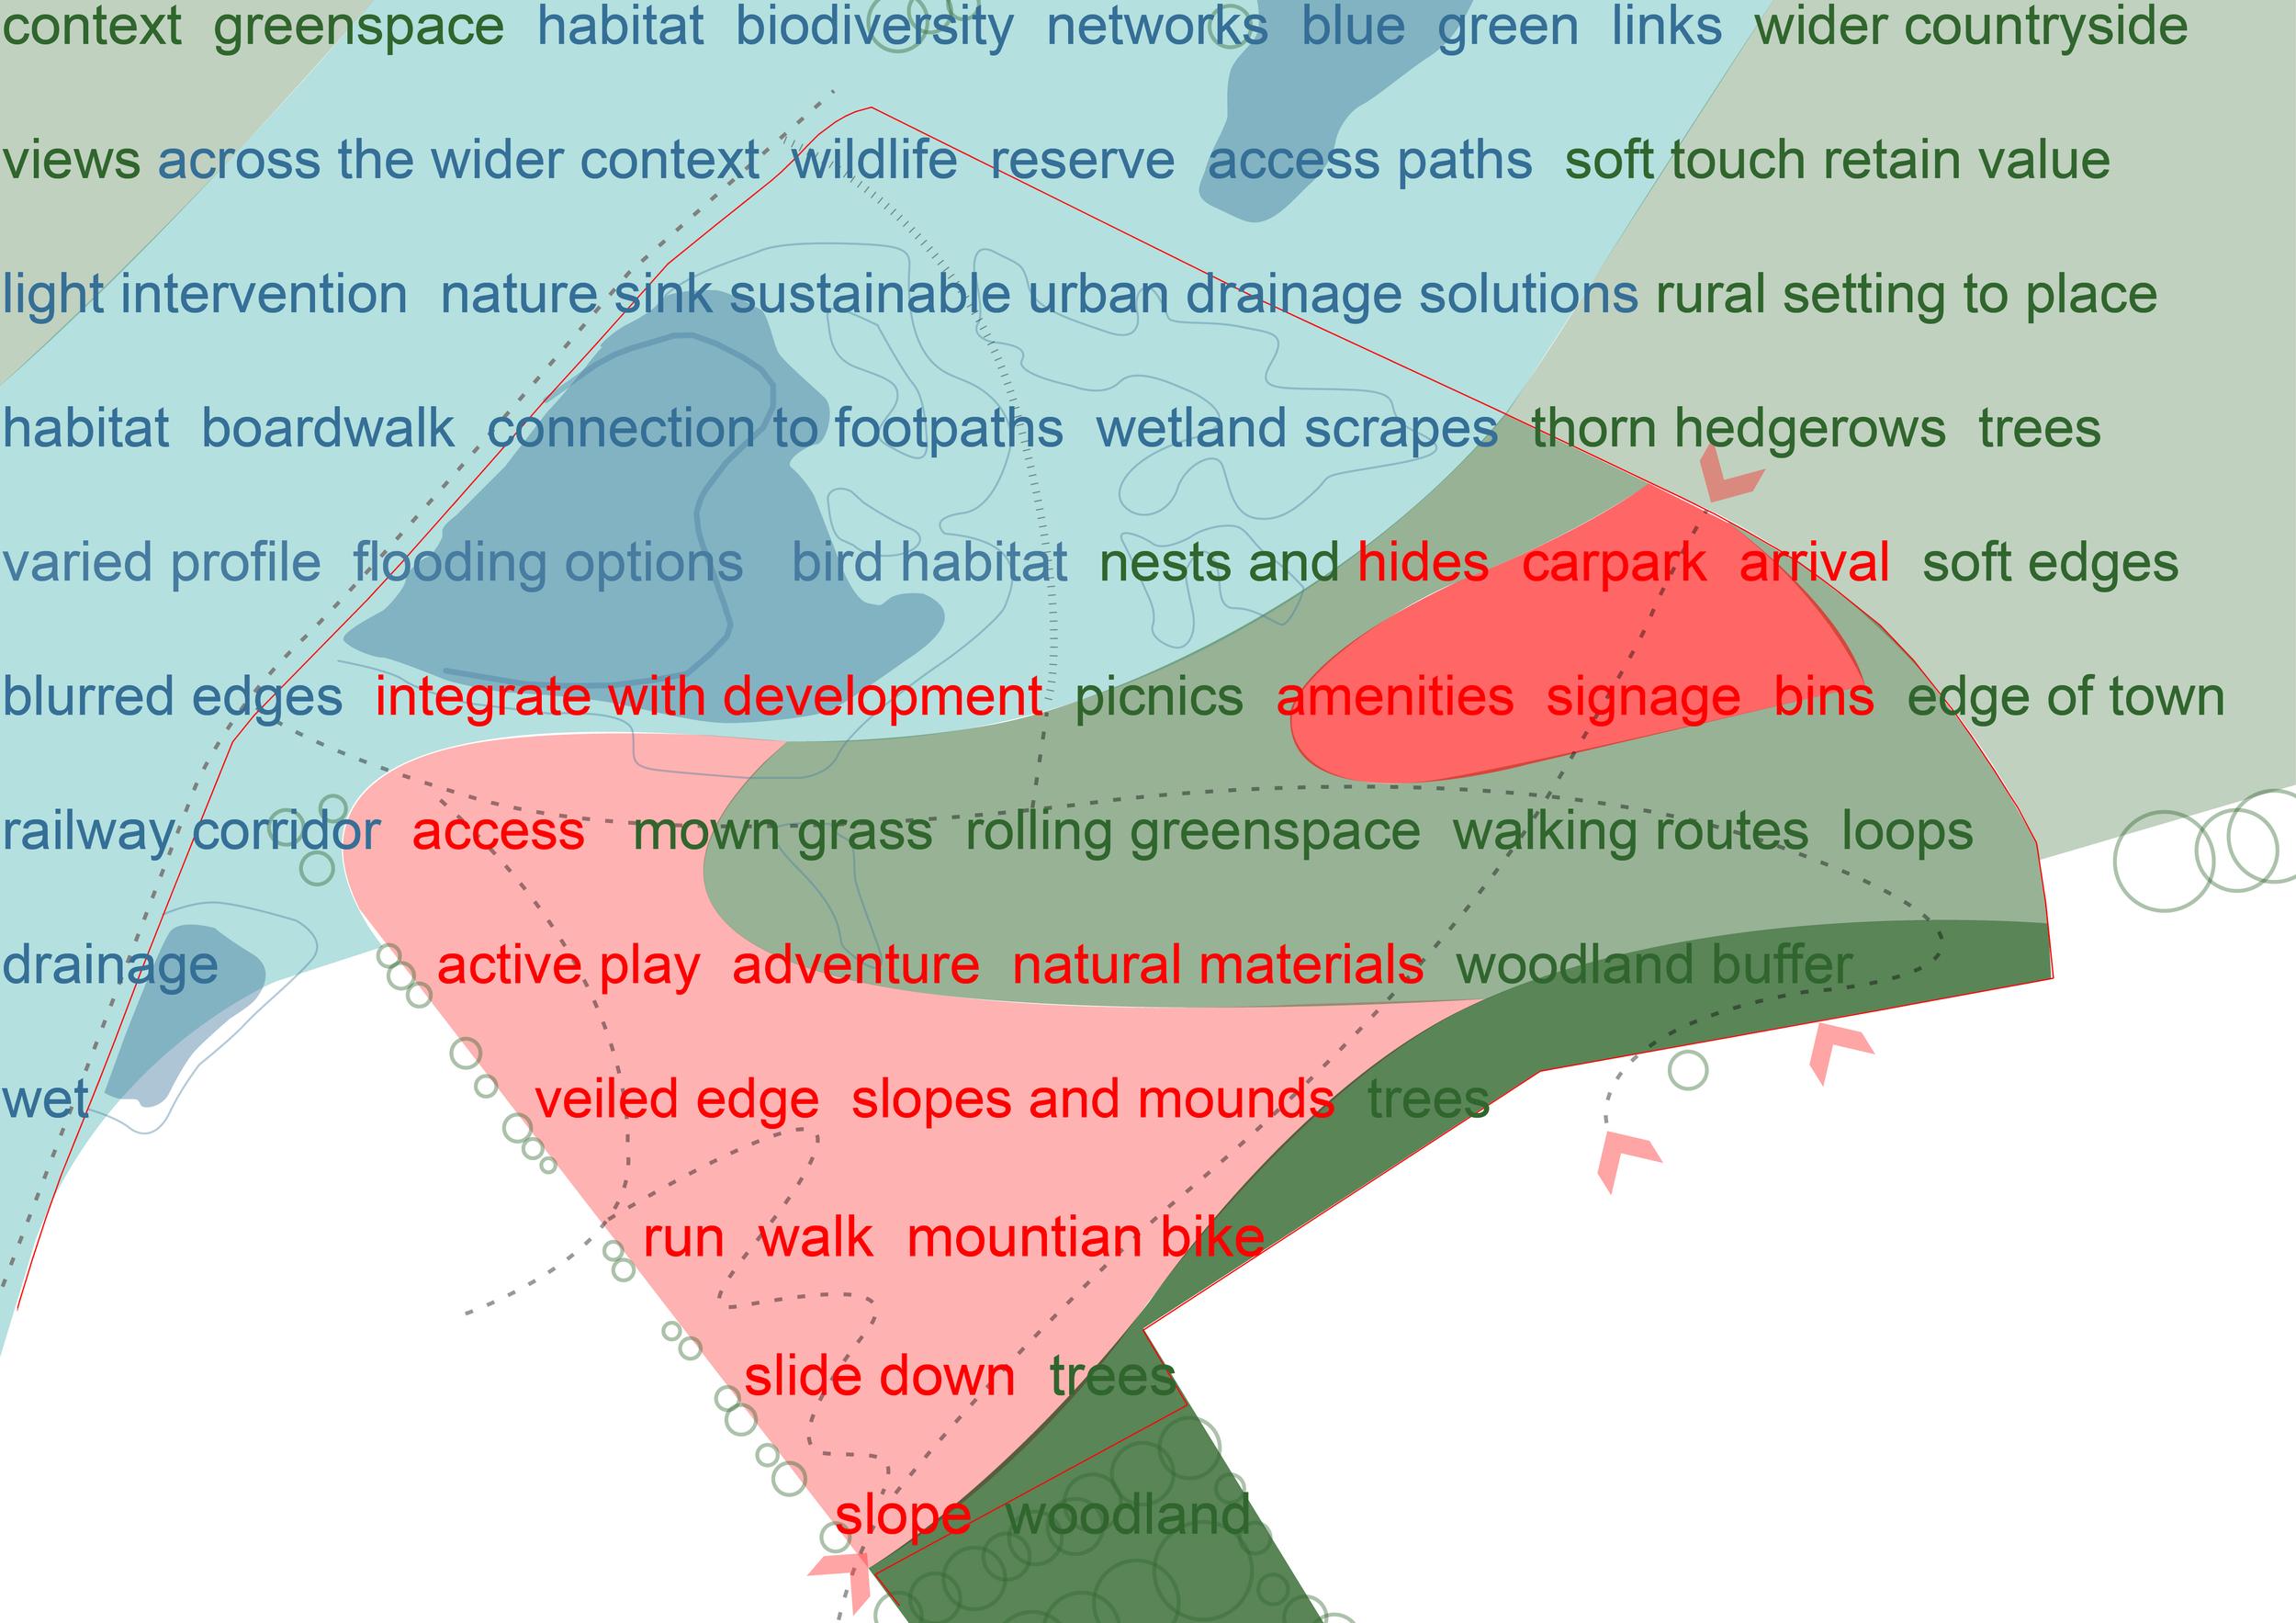 Glenboig_programme diagram.jpg